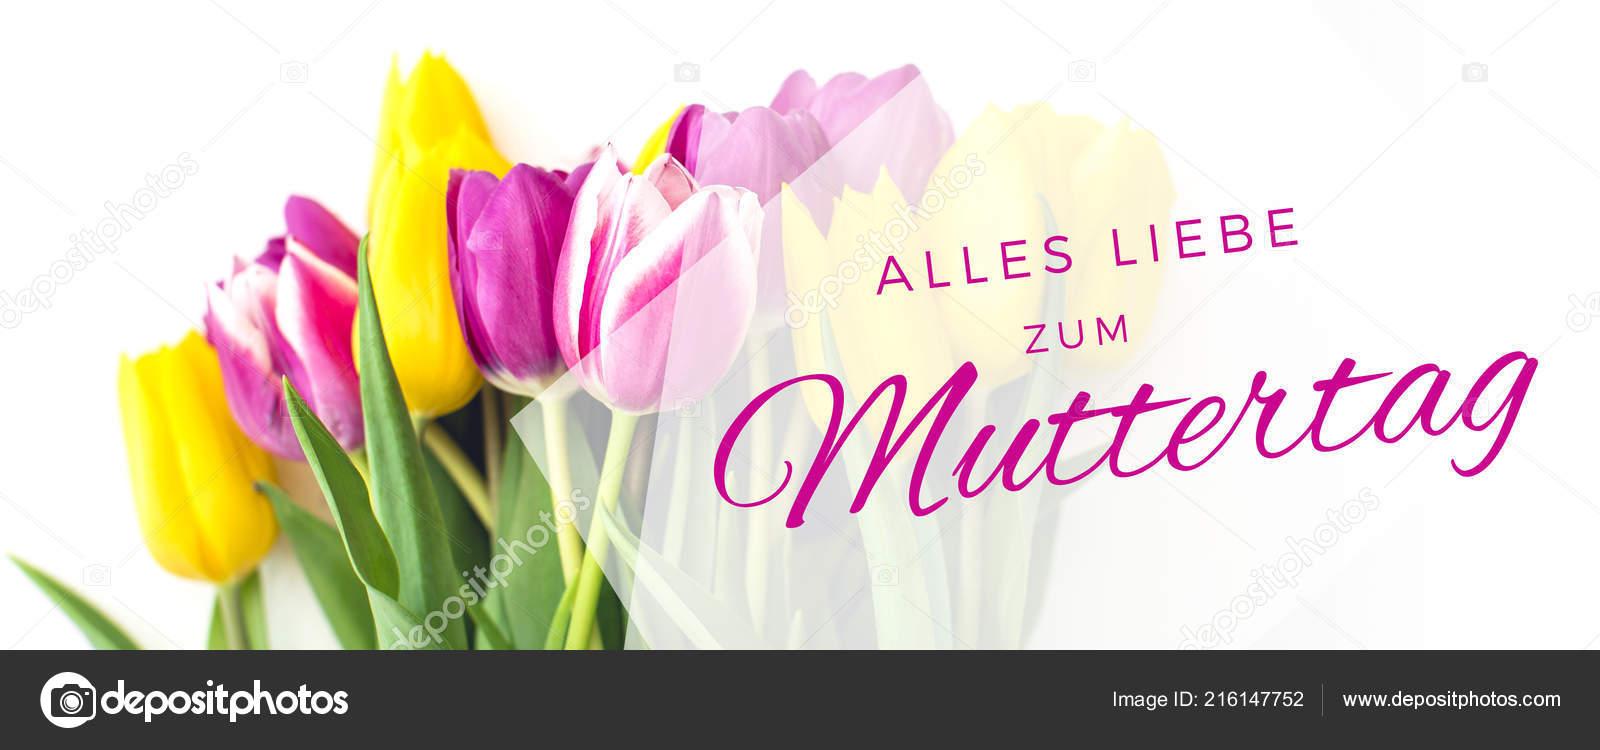 Greeting Card Pink Yellow Tulips Text Happy Birthday German